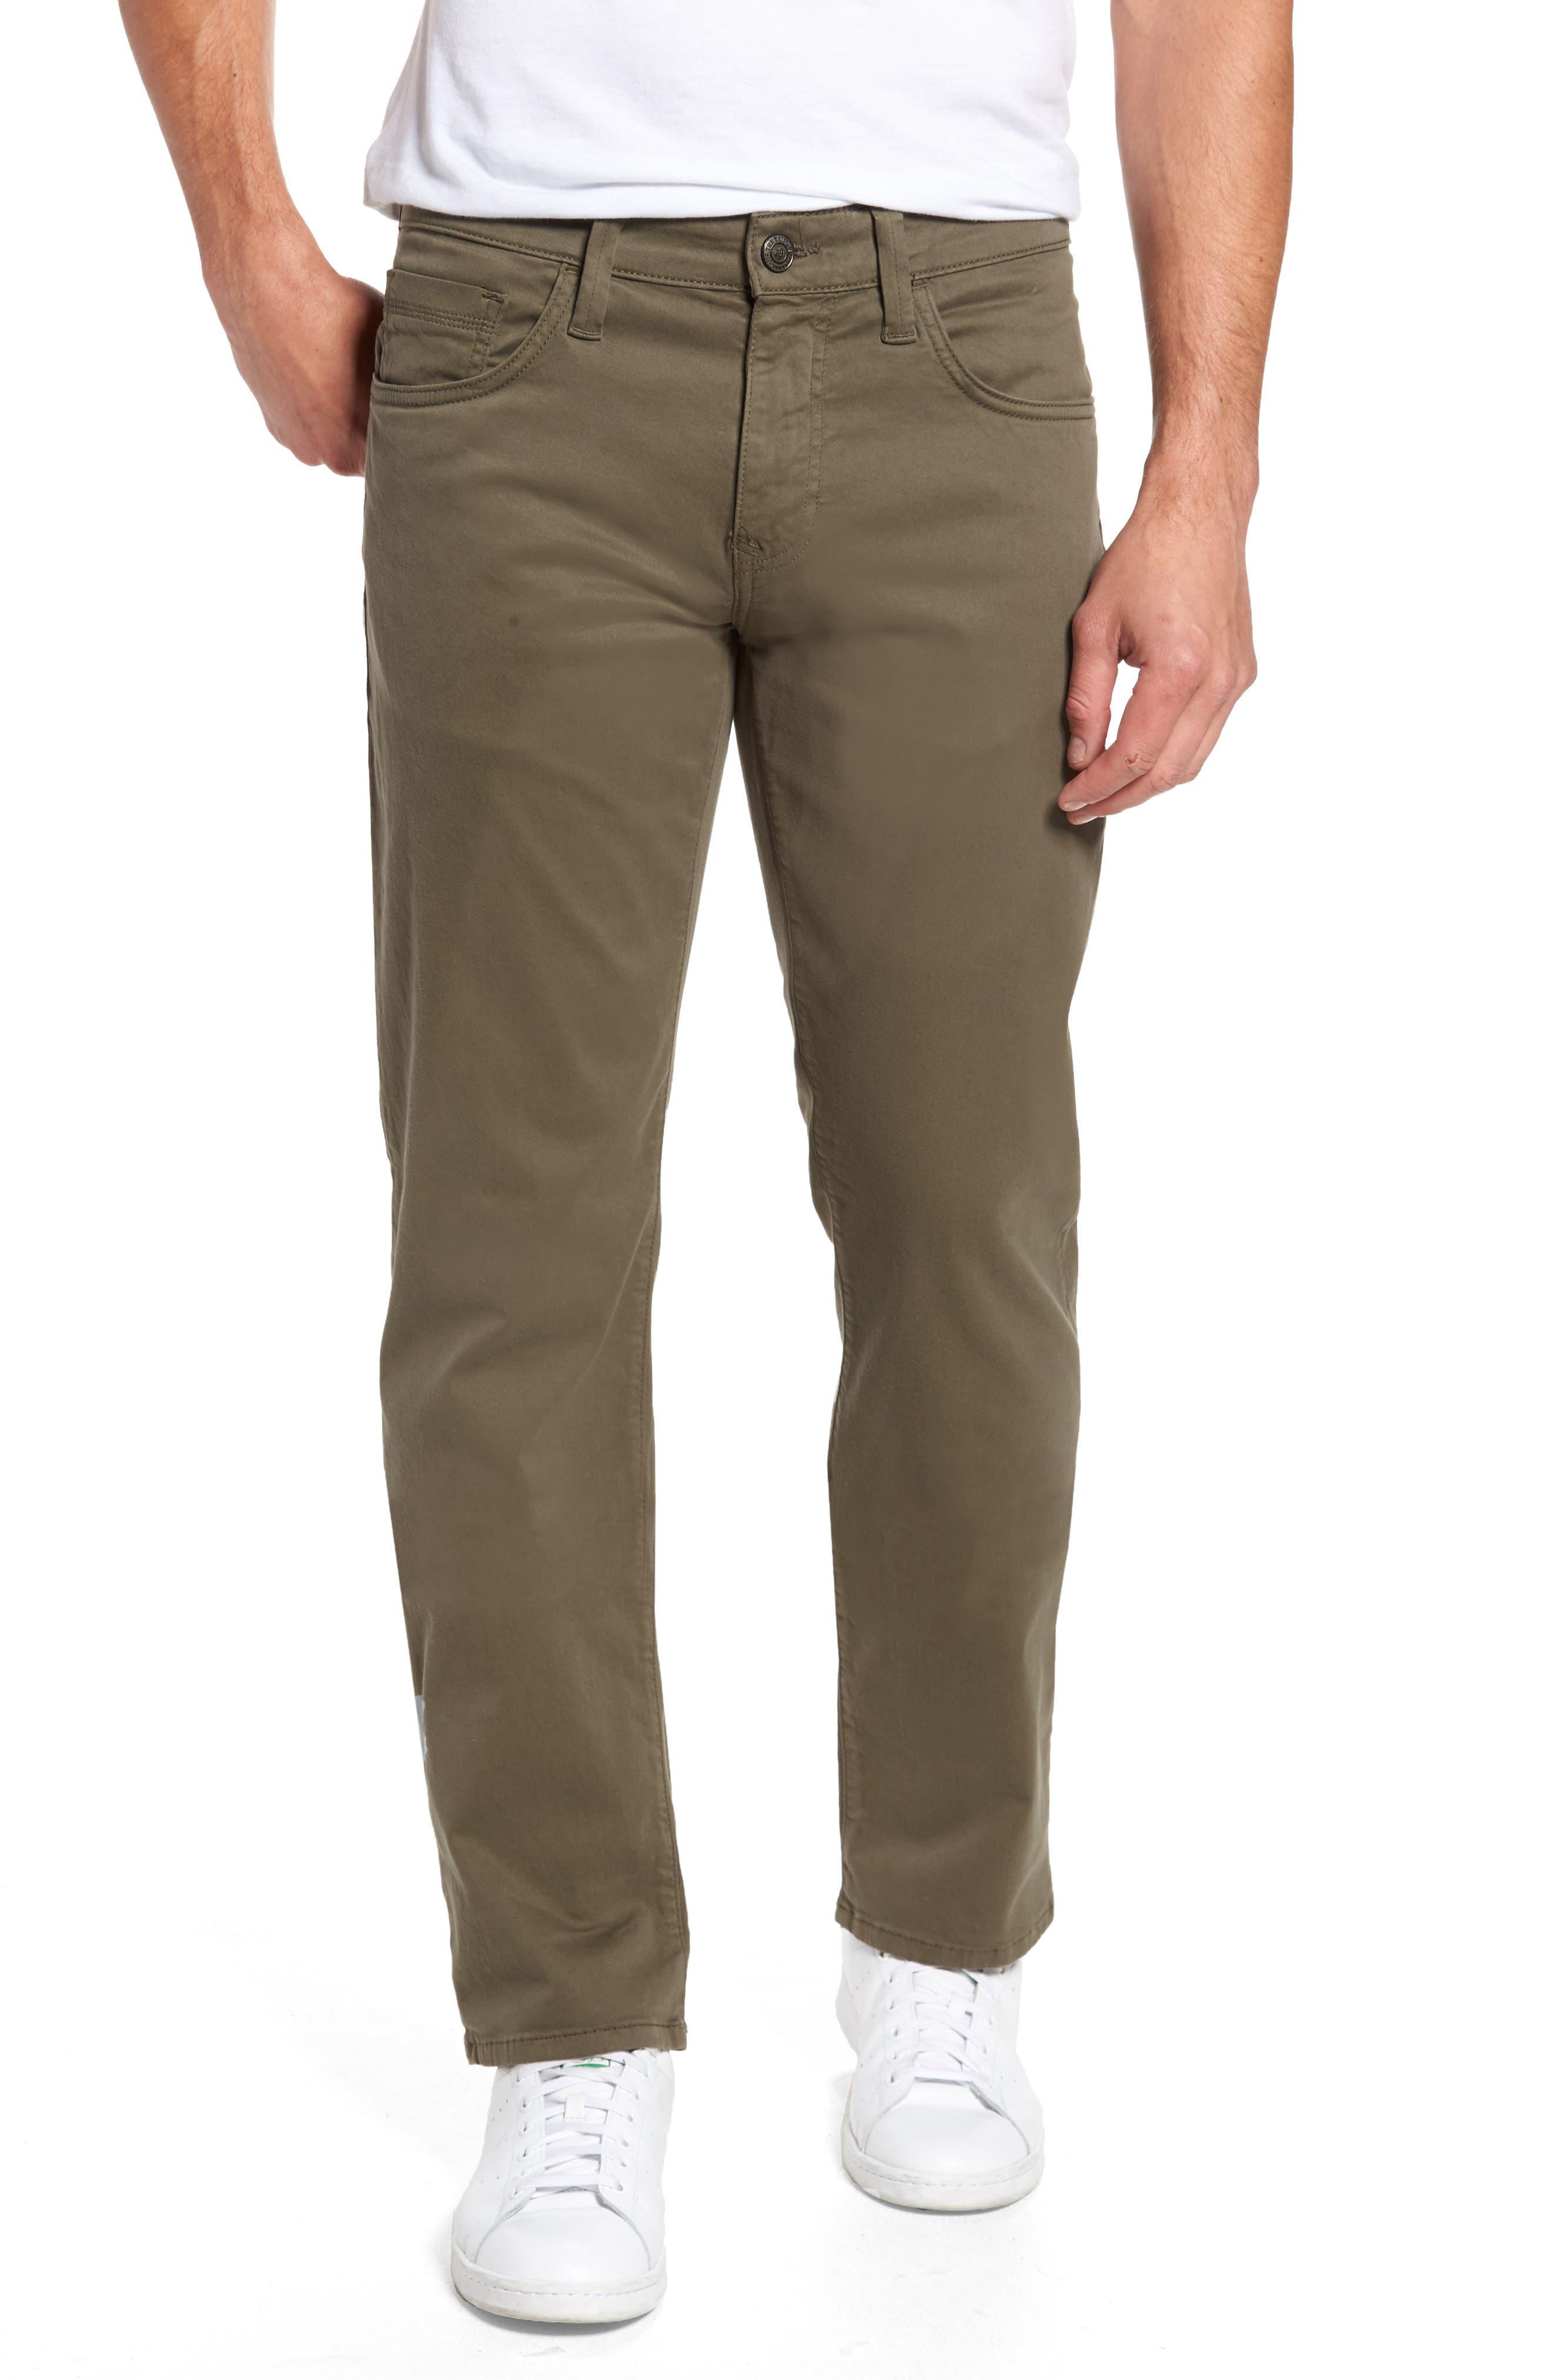 Main Image - Mavi Jeans Zach Straight Fit Twill Pants (Dusty Olive Twill)